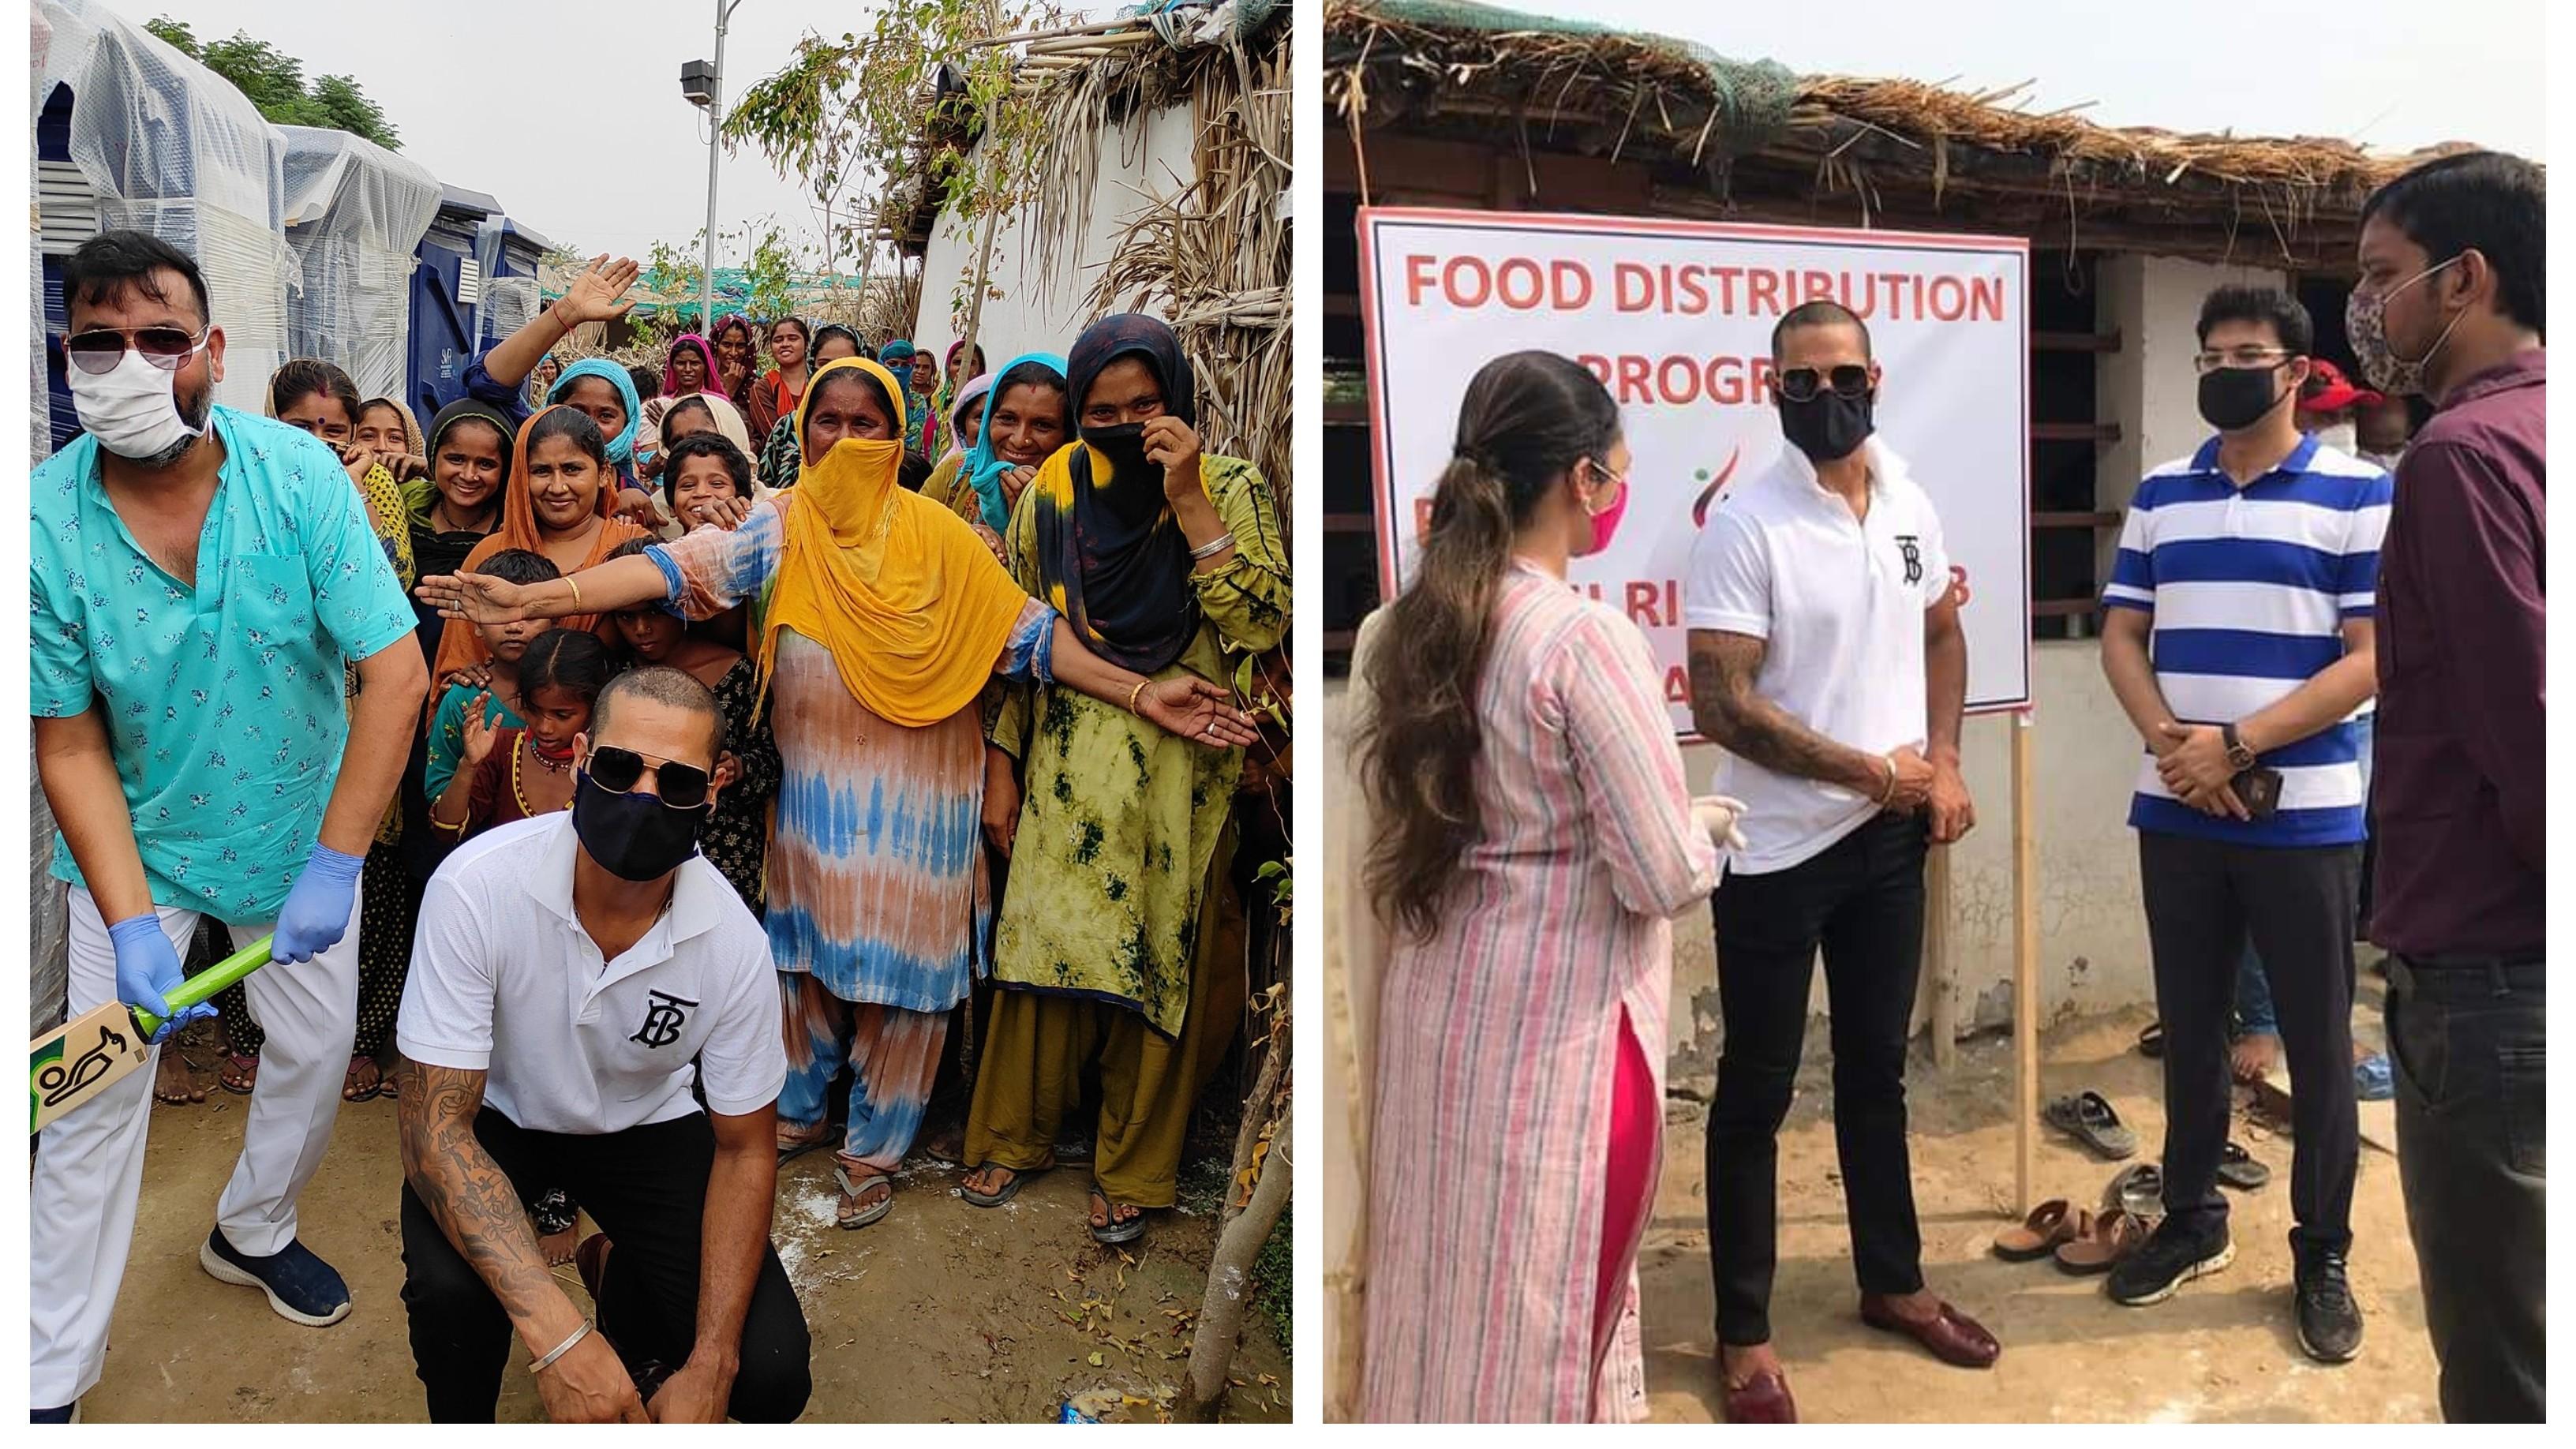 WATCH: Shikhar Dhawan visits Pakistani Hindu refugee camp in Delhi, gifts them modular toilets & cricket kits